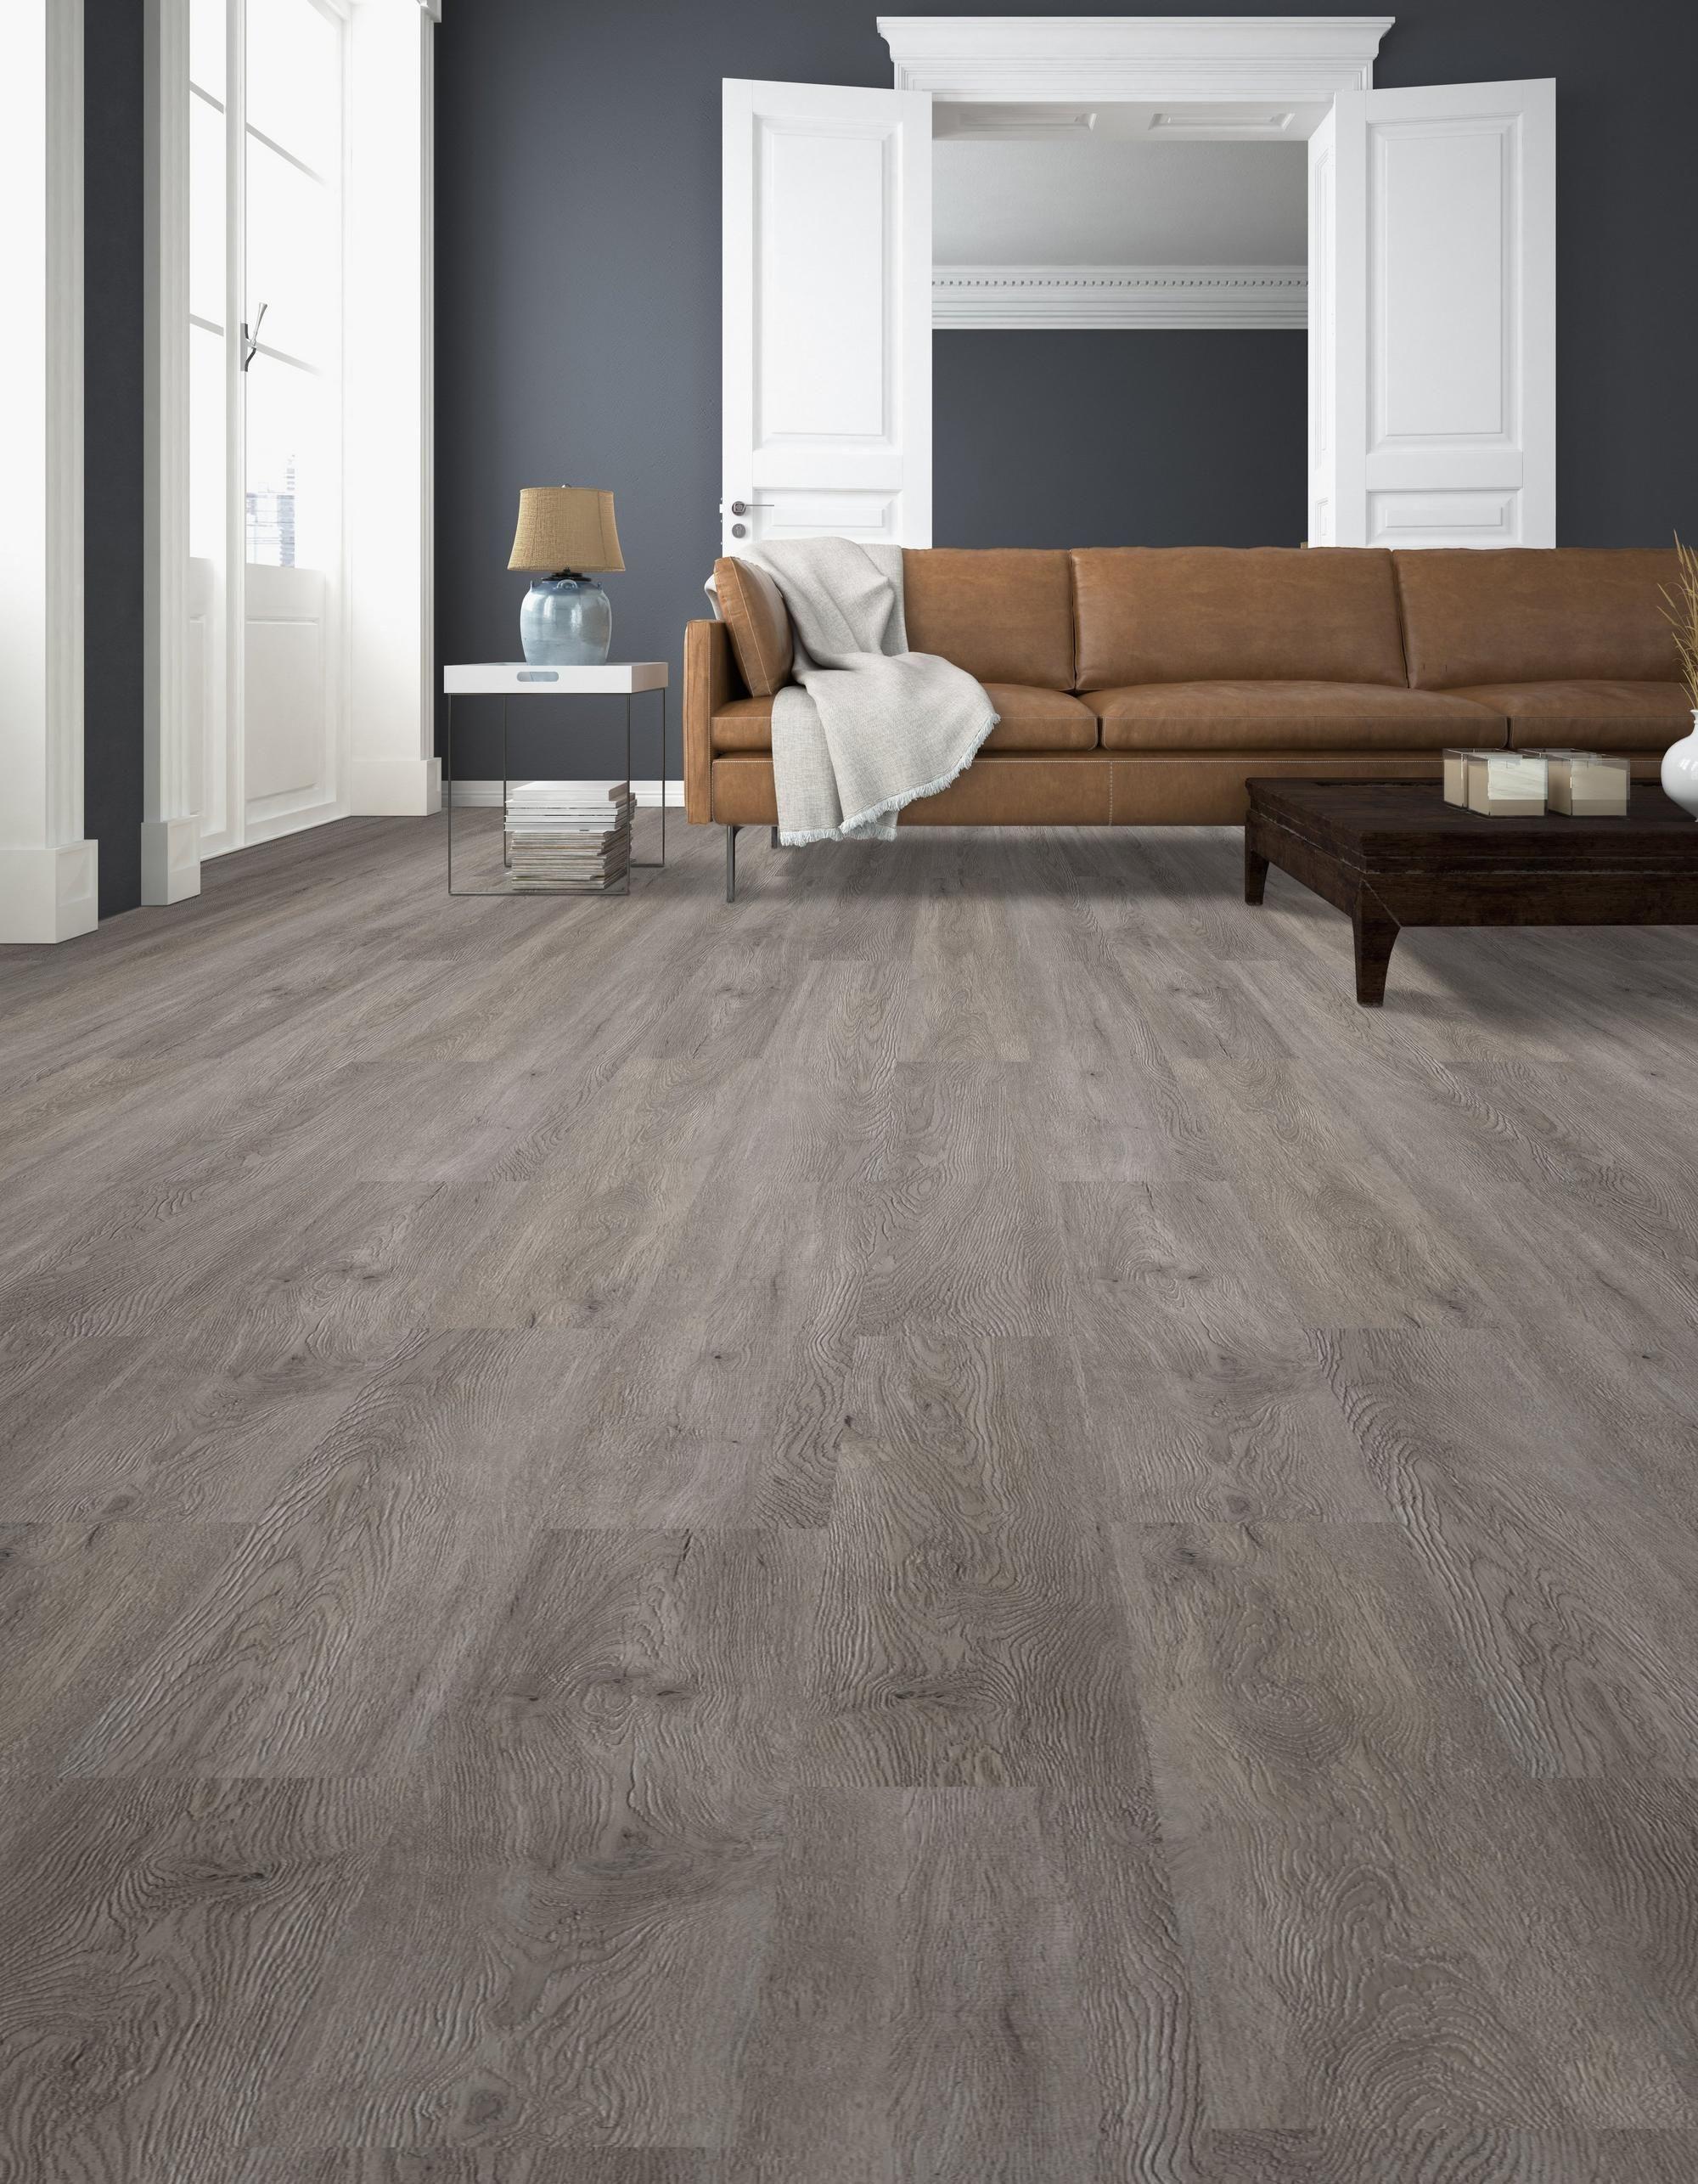 Wpc Farmwood Waterproof Laminate Flooring Composite Flooring Flooring